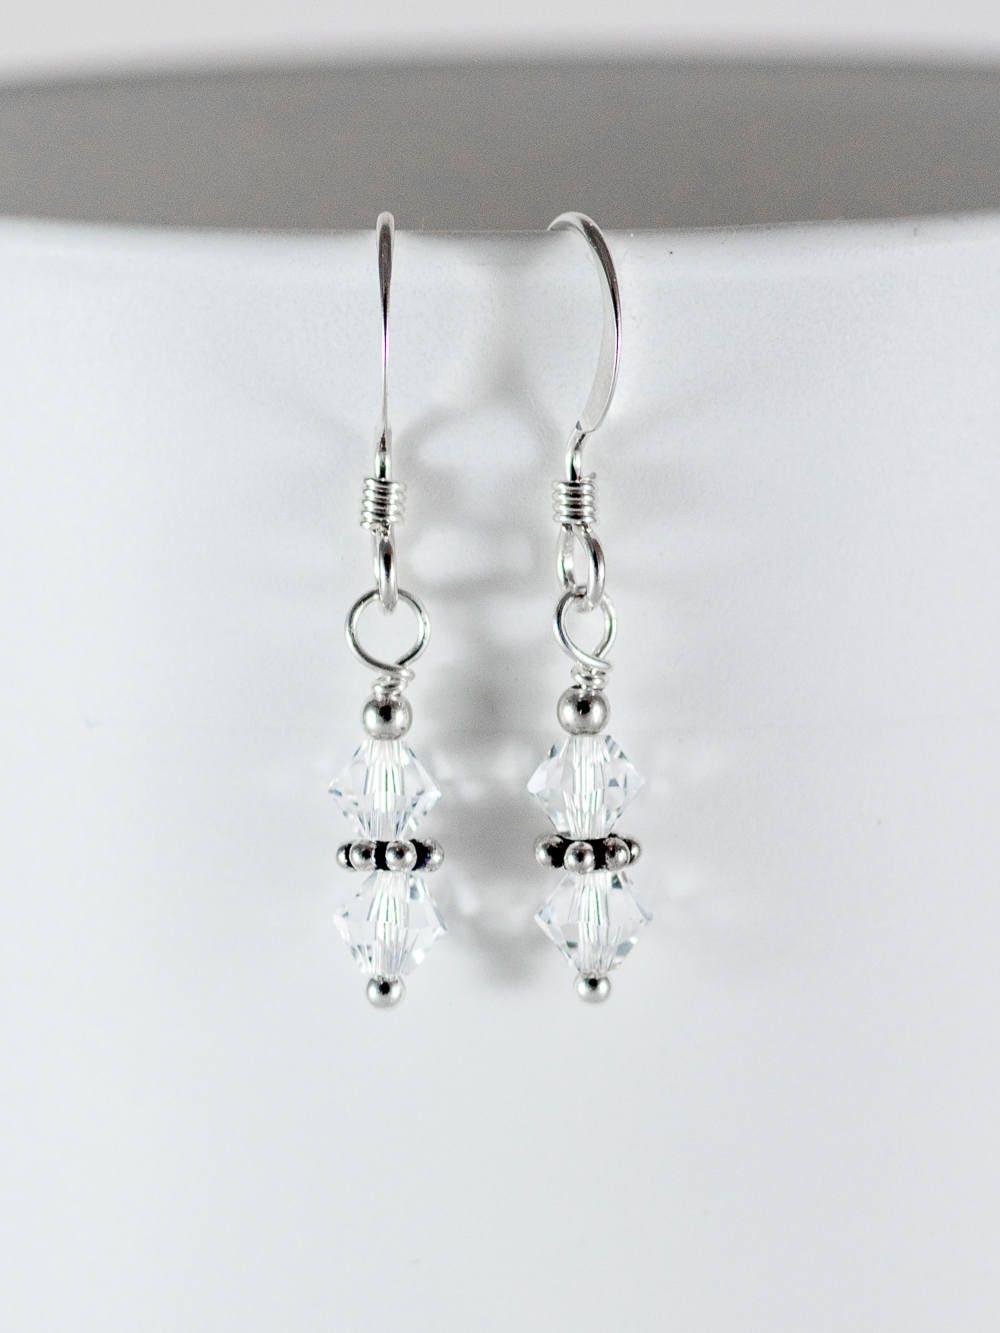 Crystal Earrings  Swarovski Earrings  Sparkly Earrings  Bead Earrings   Dangle Earrings  4 Mm Clear  On Silver Or Gold